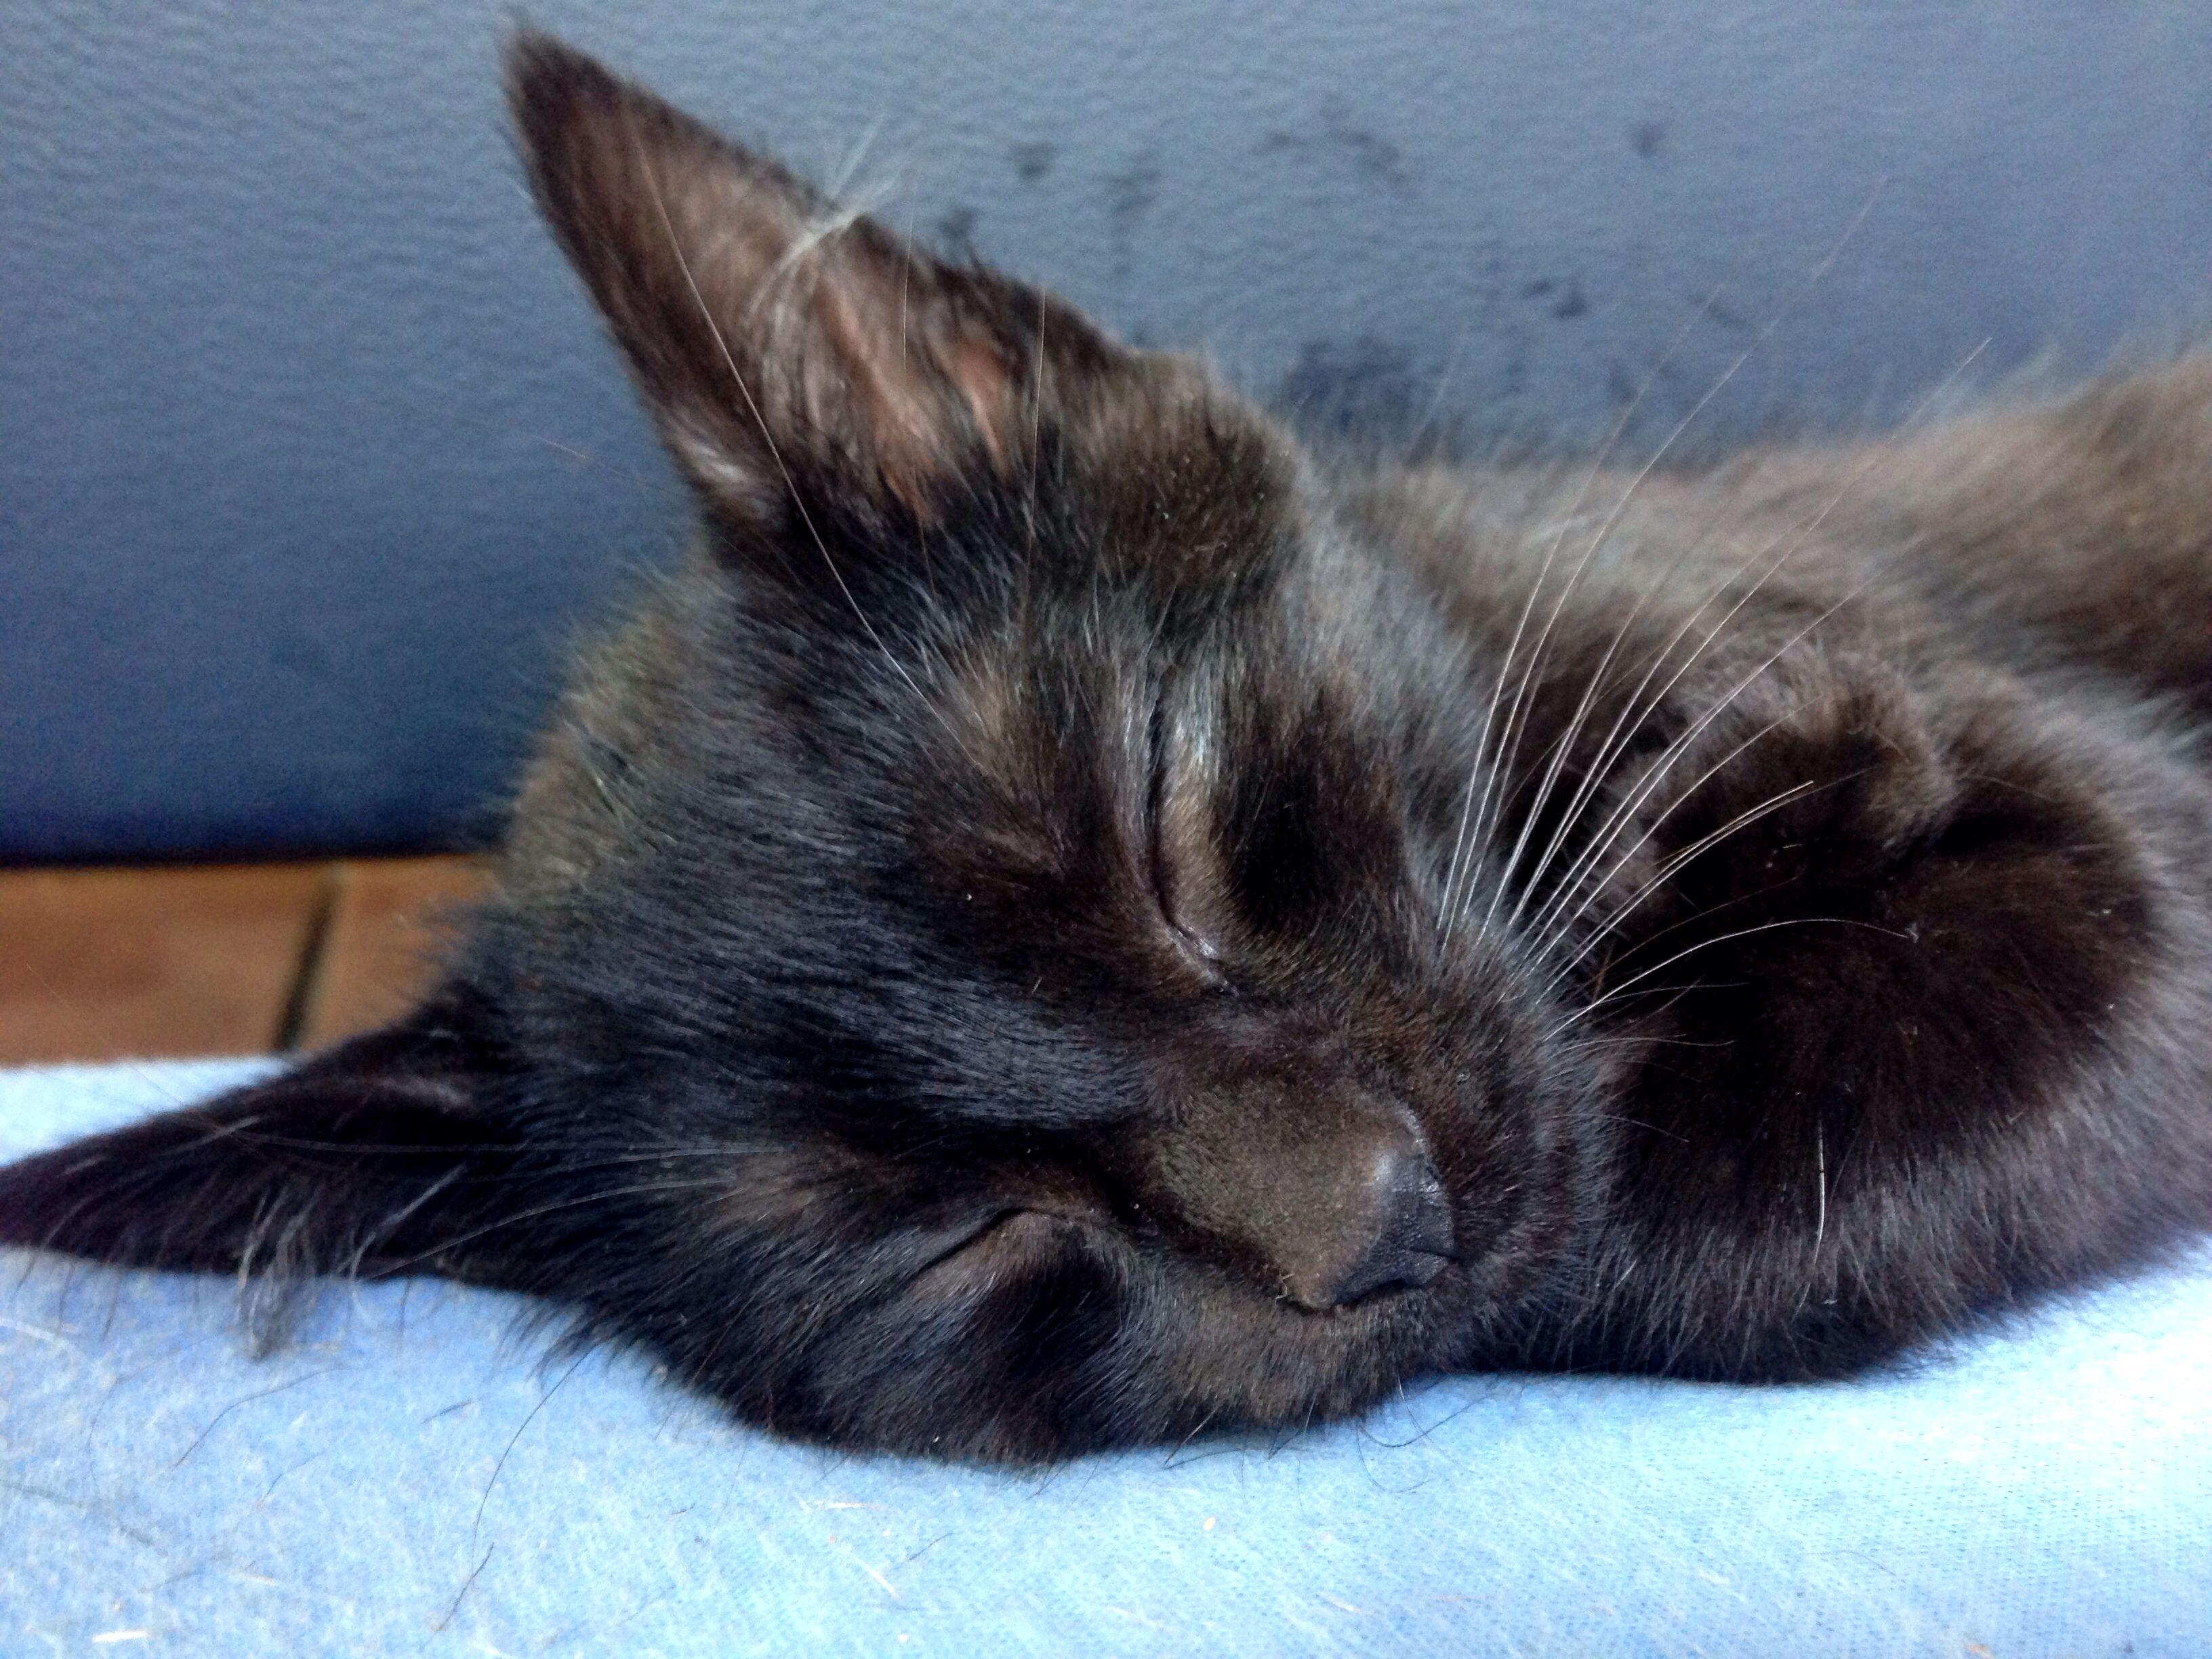 12 Week Old Black Kitten Black Kitten Cats Cute Animals